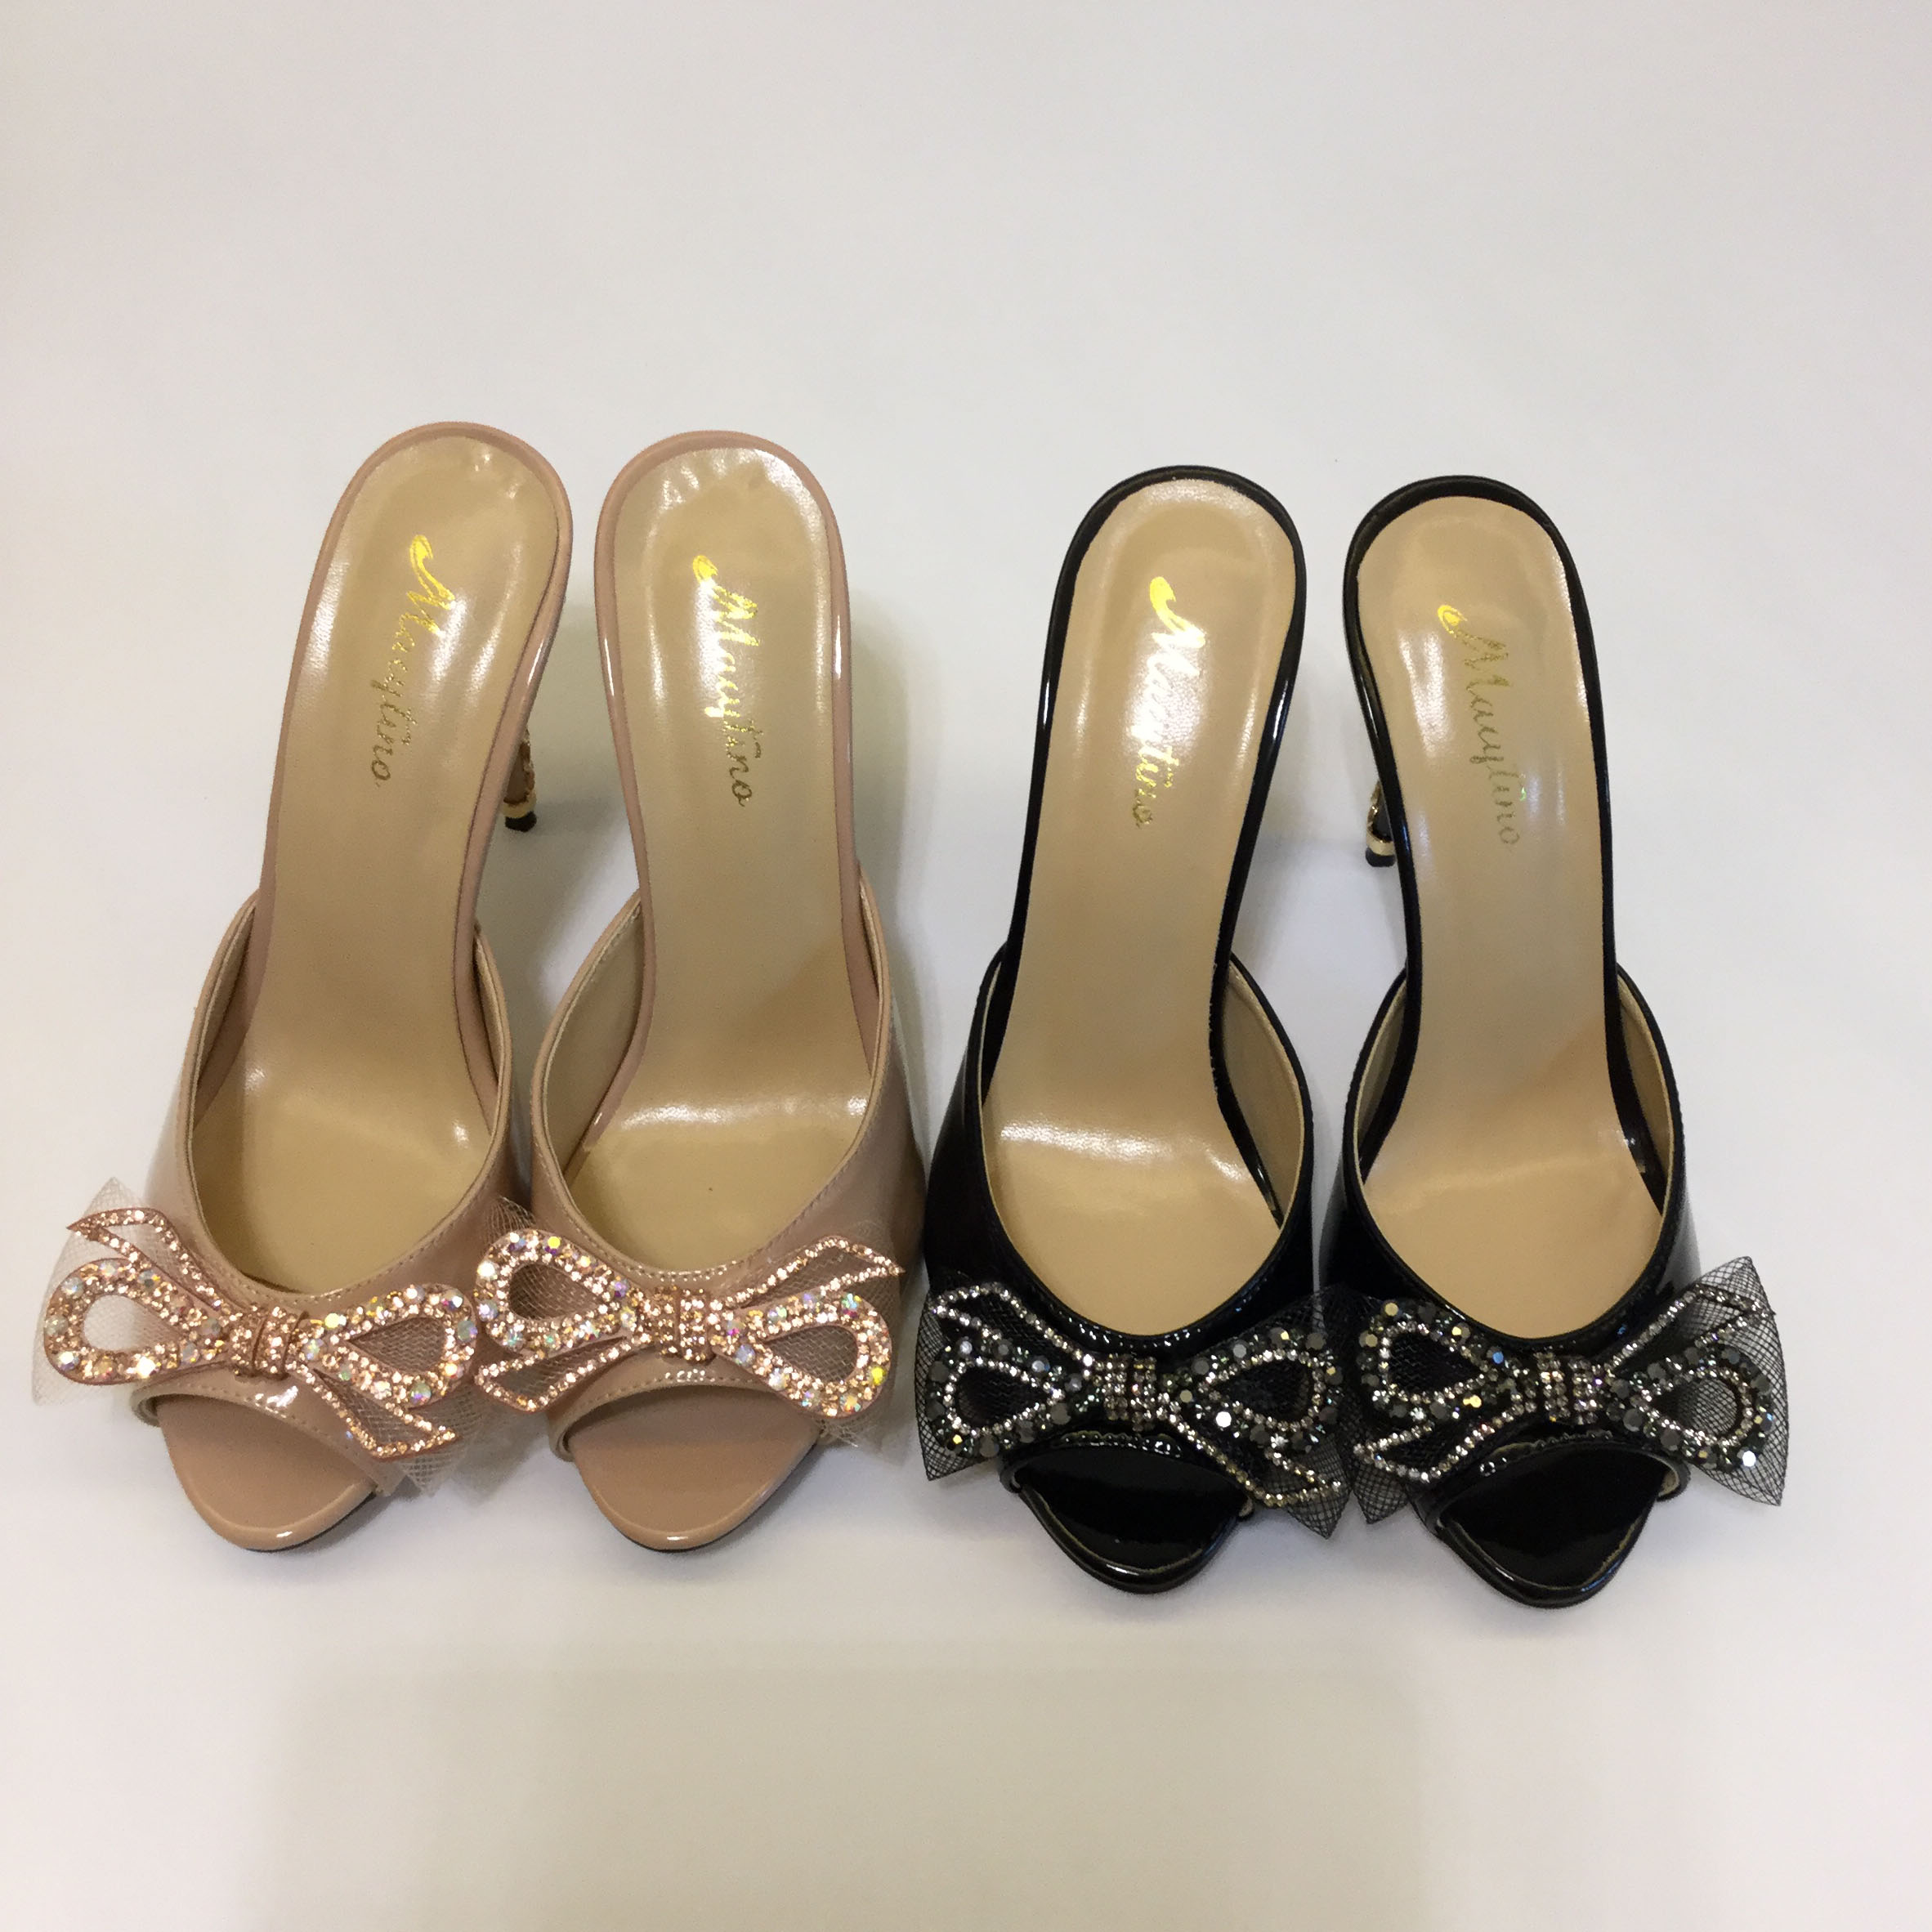 Macytino Nude Black Flower High Heel Dress Mules Open Toe Beading Bowtie Summer Slides Plus Size Shoes Women